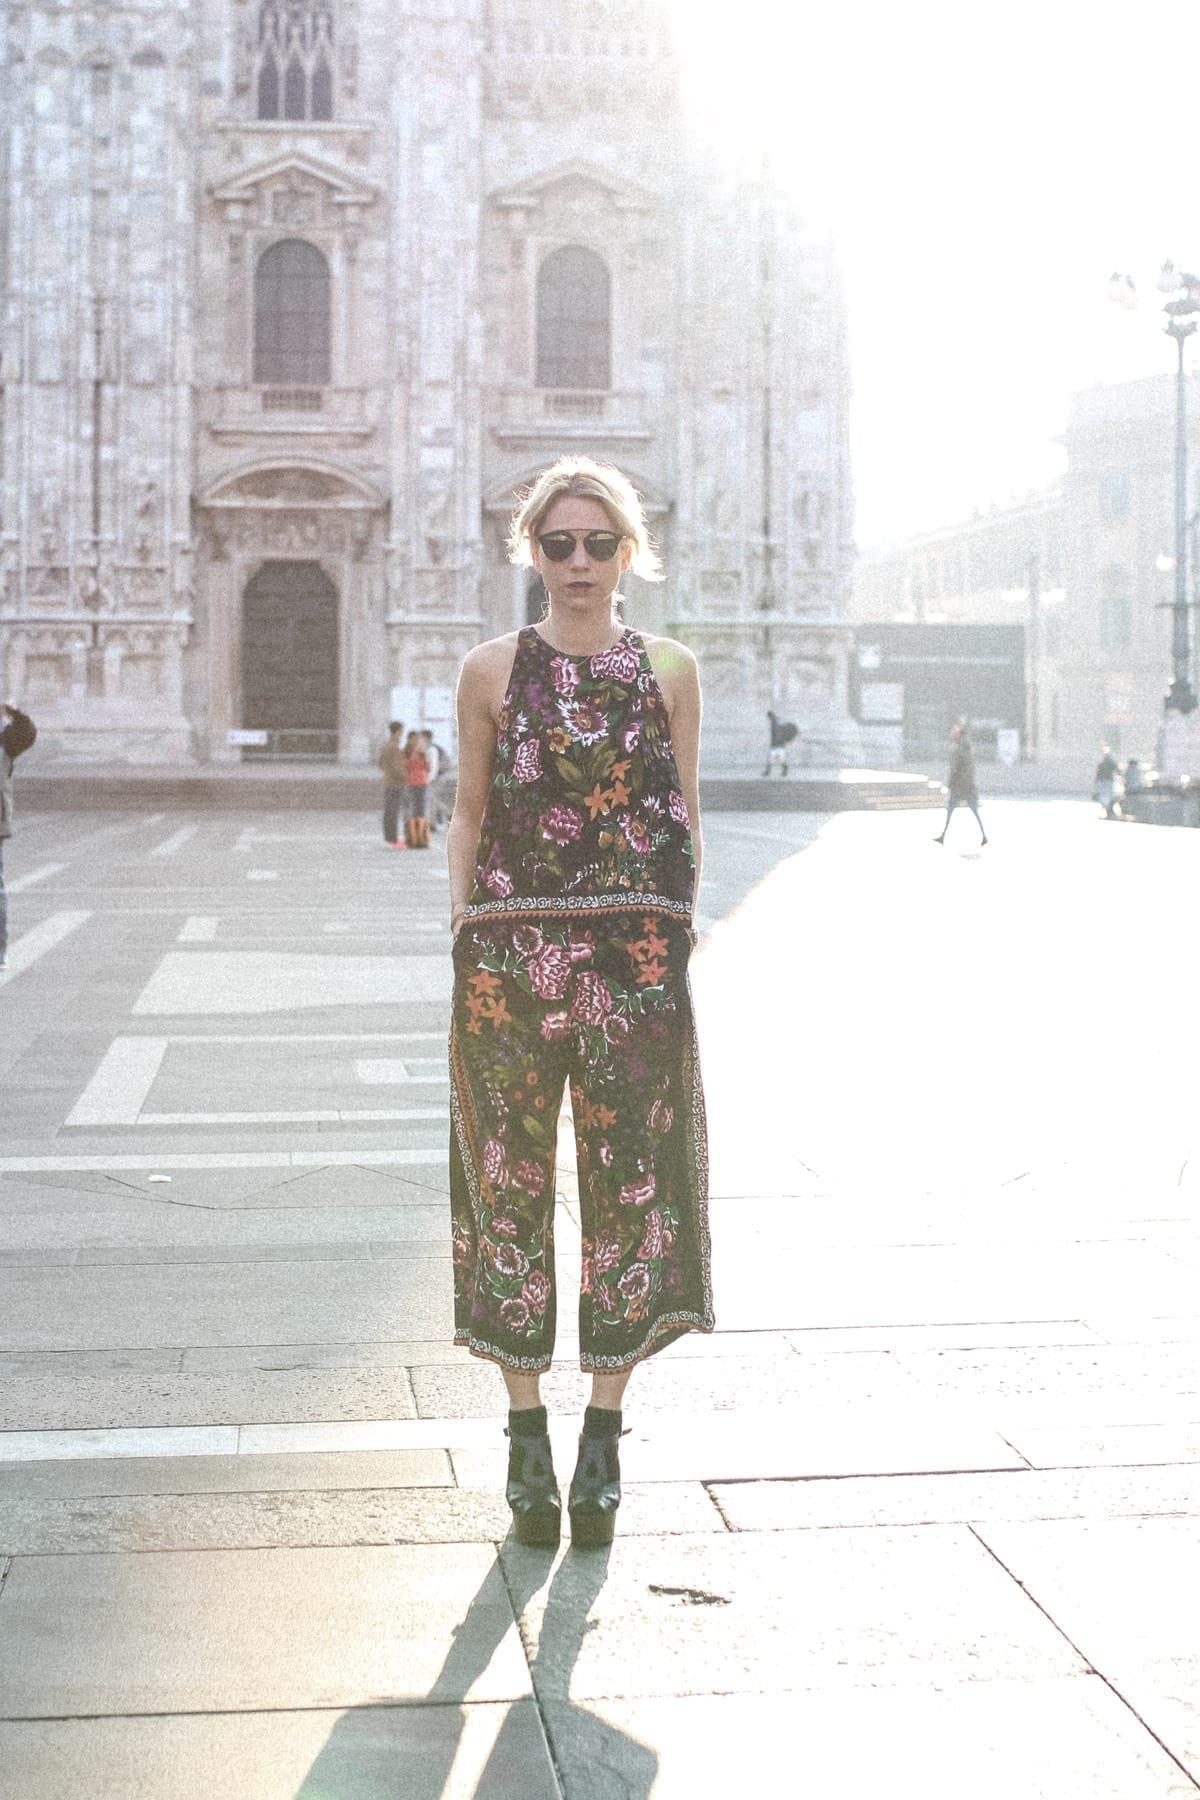 CK_1604_Constantly-K-milano-street-style-fashion-eataly-3802